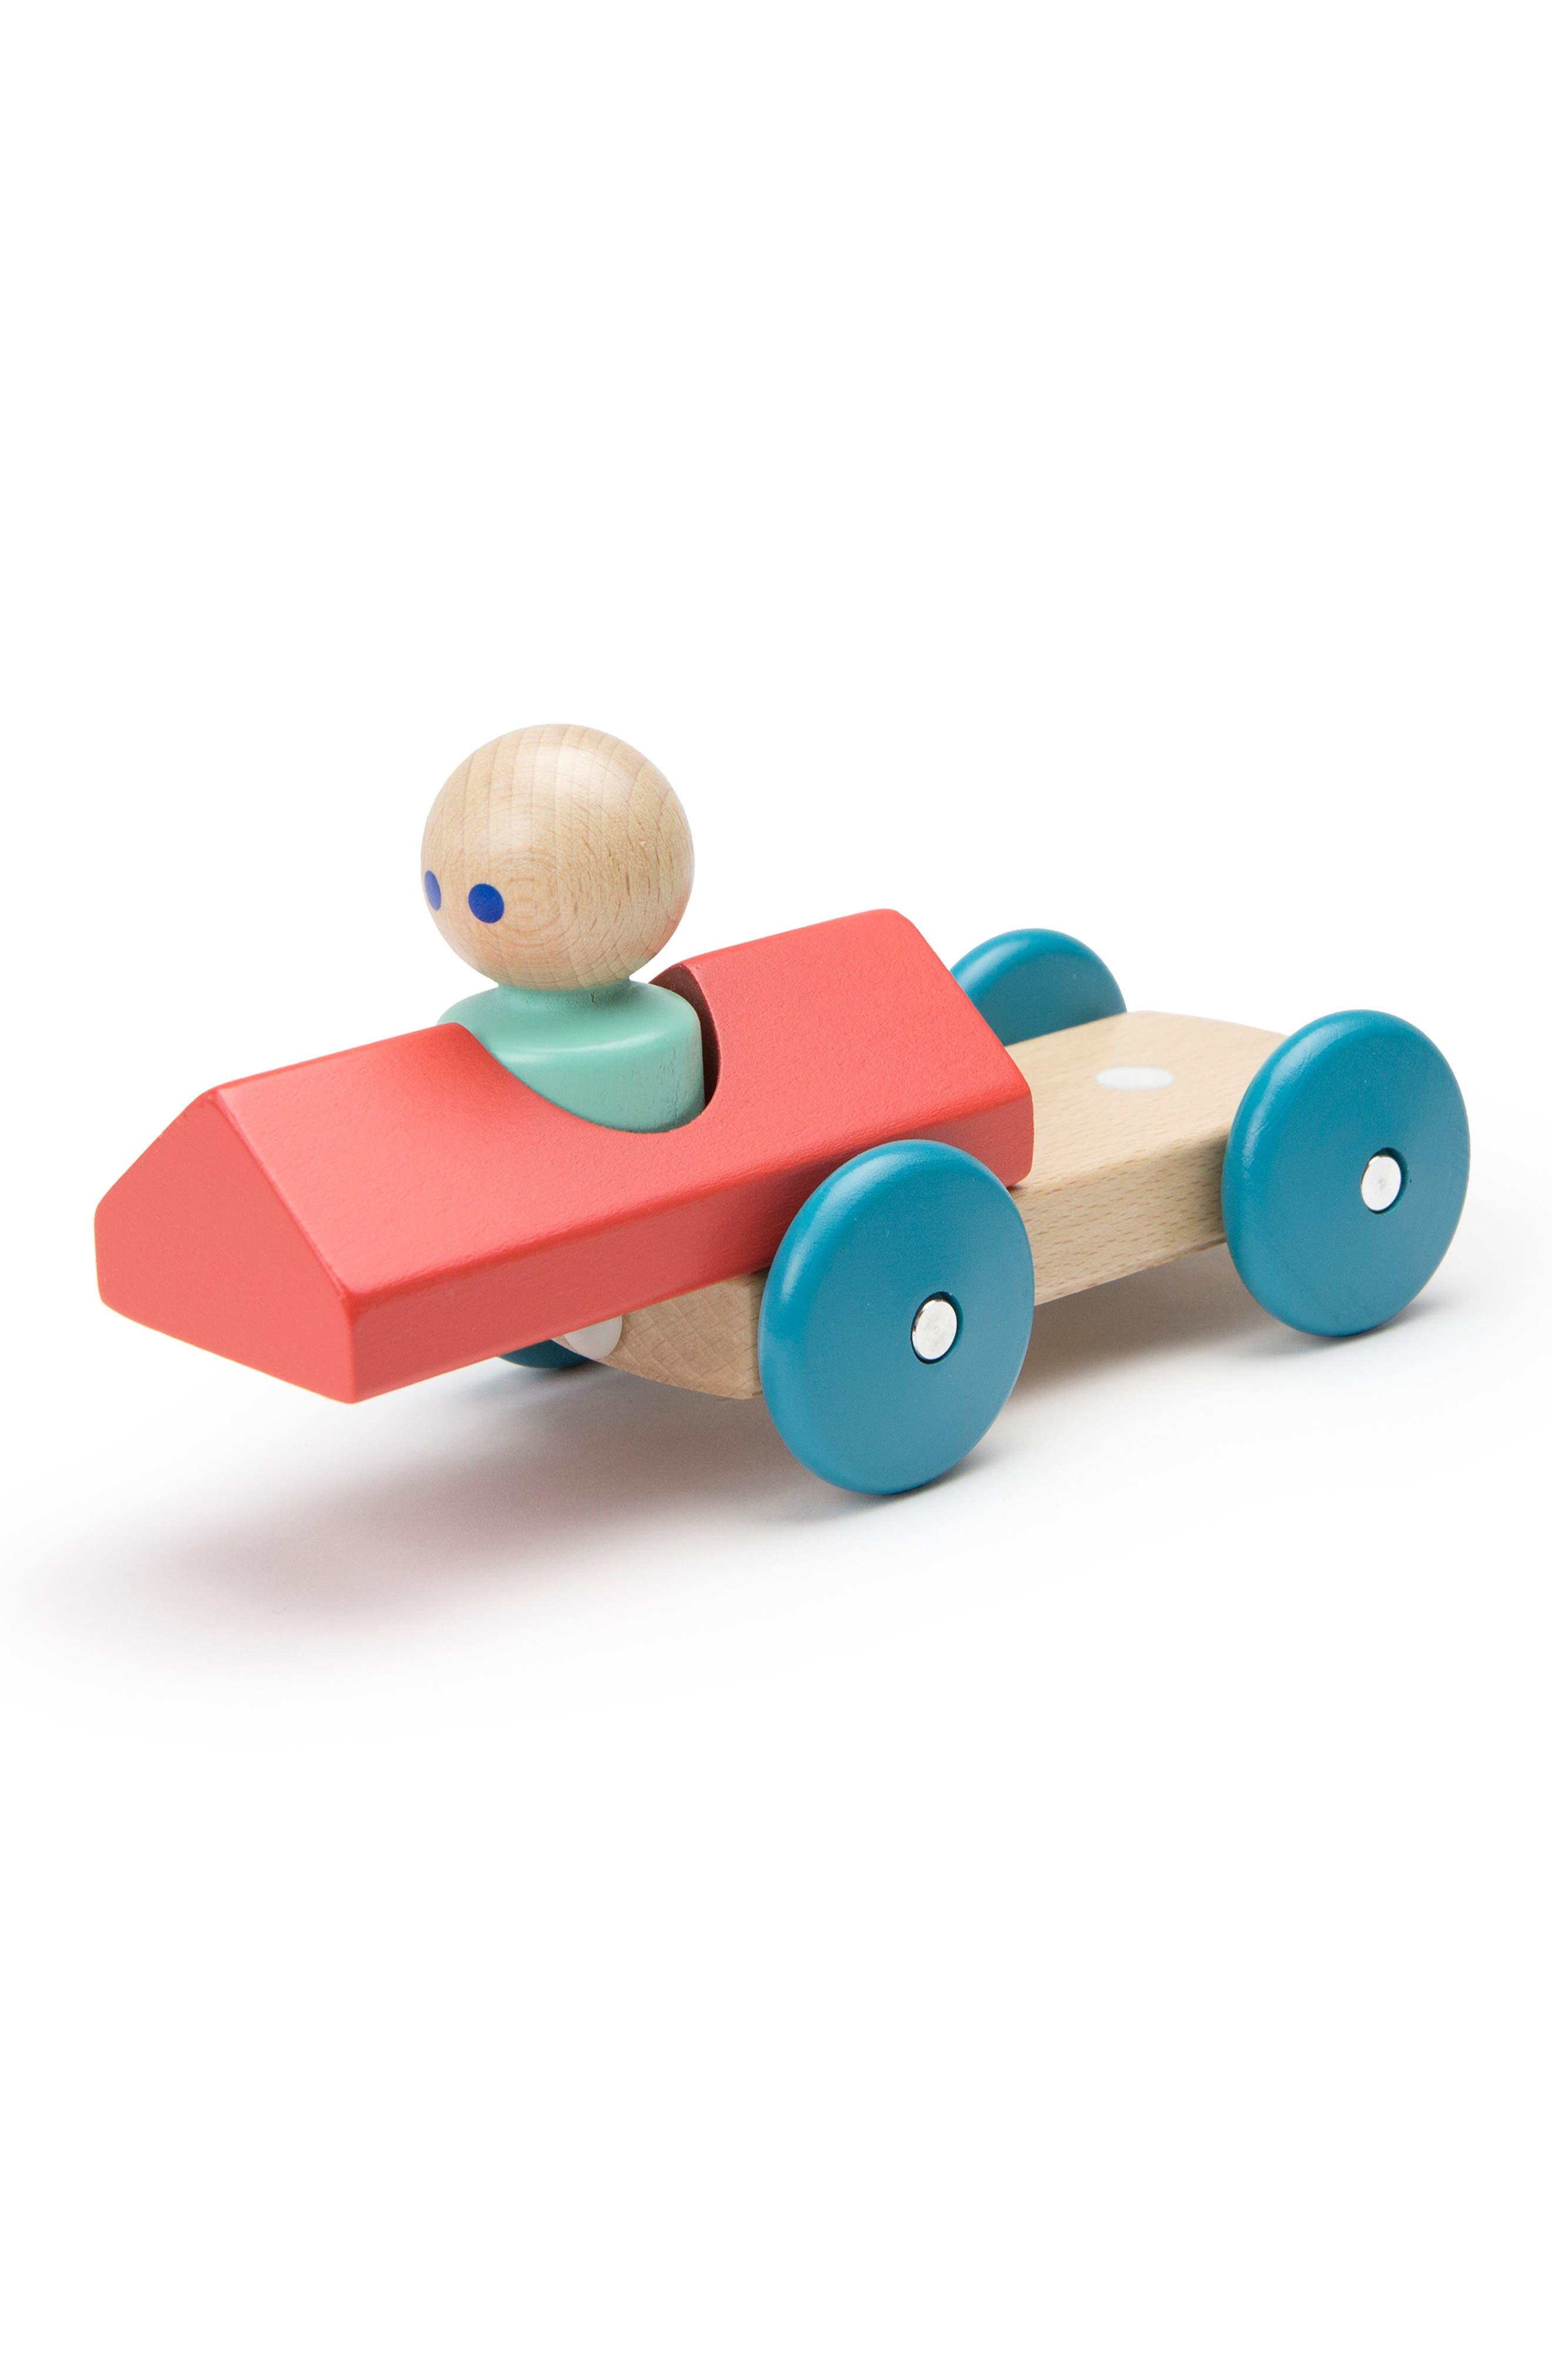 Barn Magnetic Racer Toy,                             Alternate thumbnail 2, color,                             RAINBOW